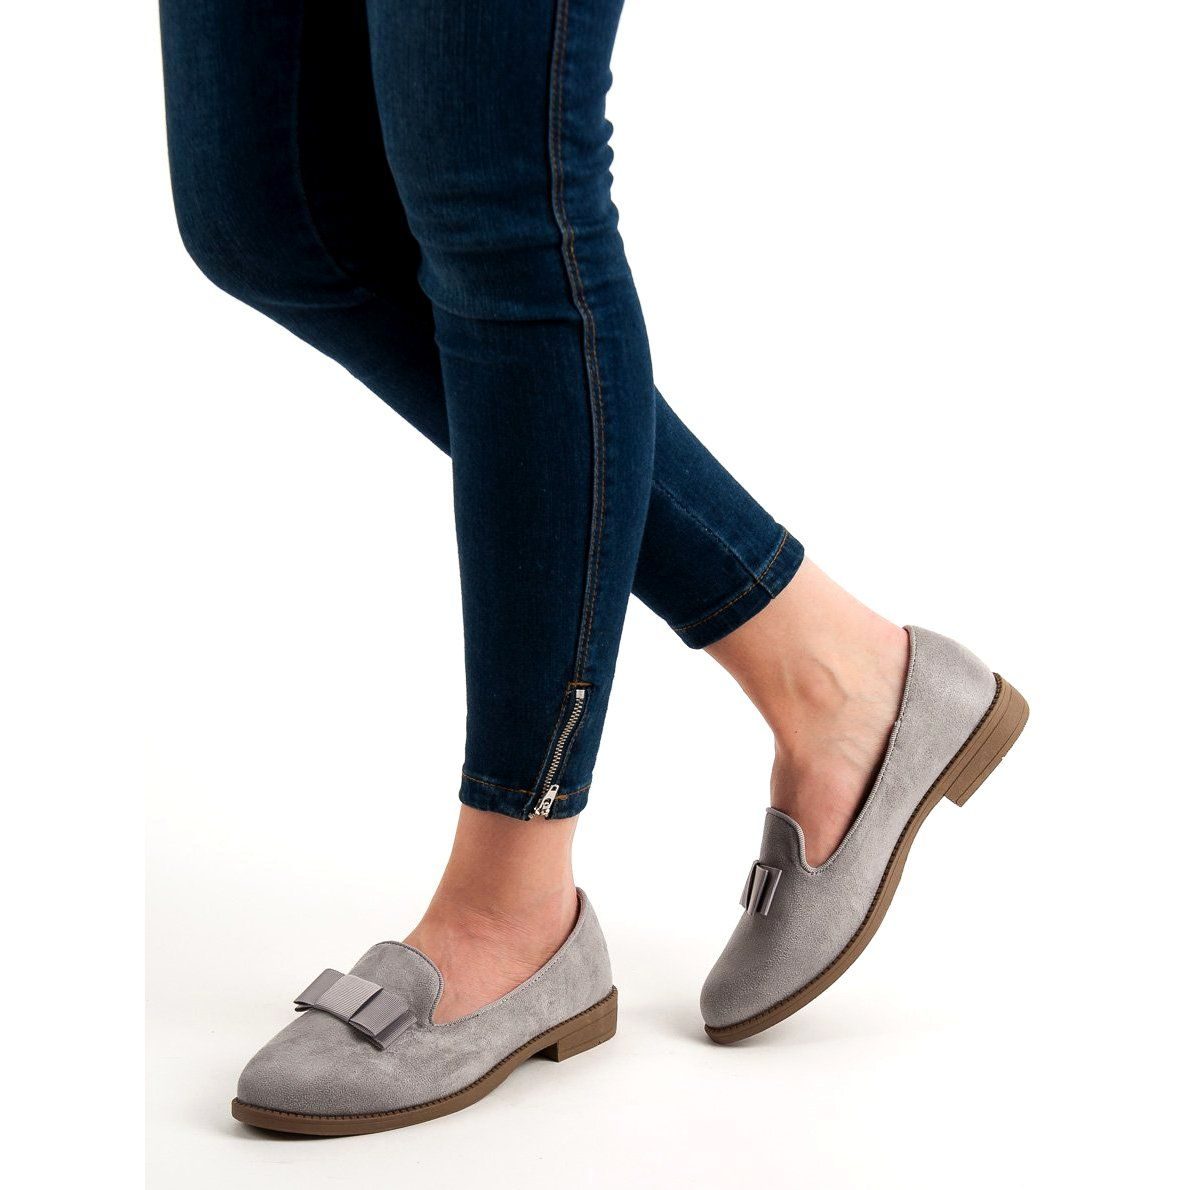 Gianvito Rossi Plexi leather heels | Heels, Women shoes